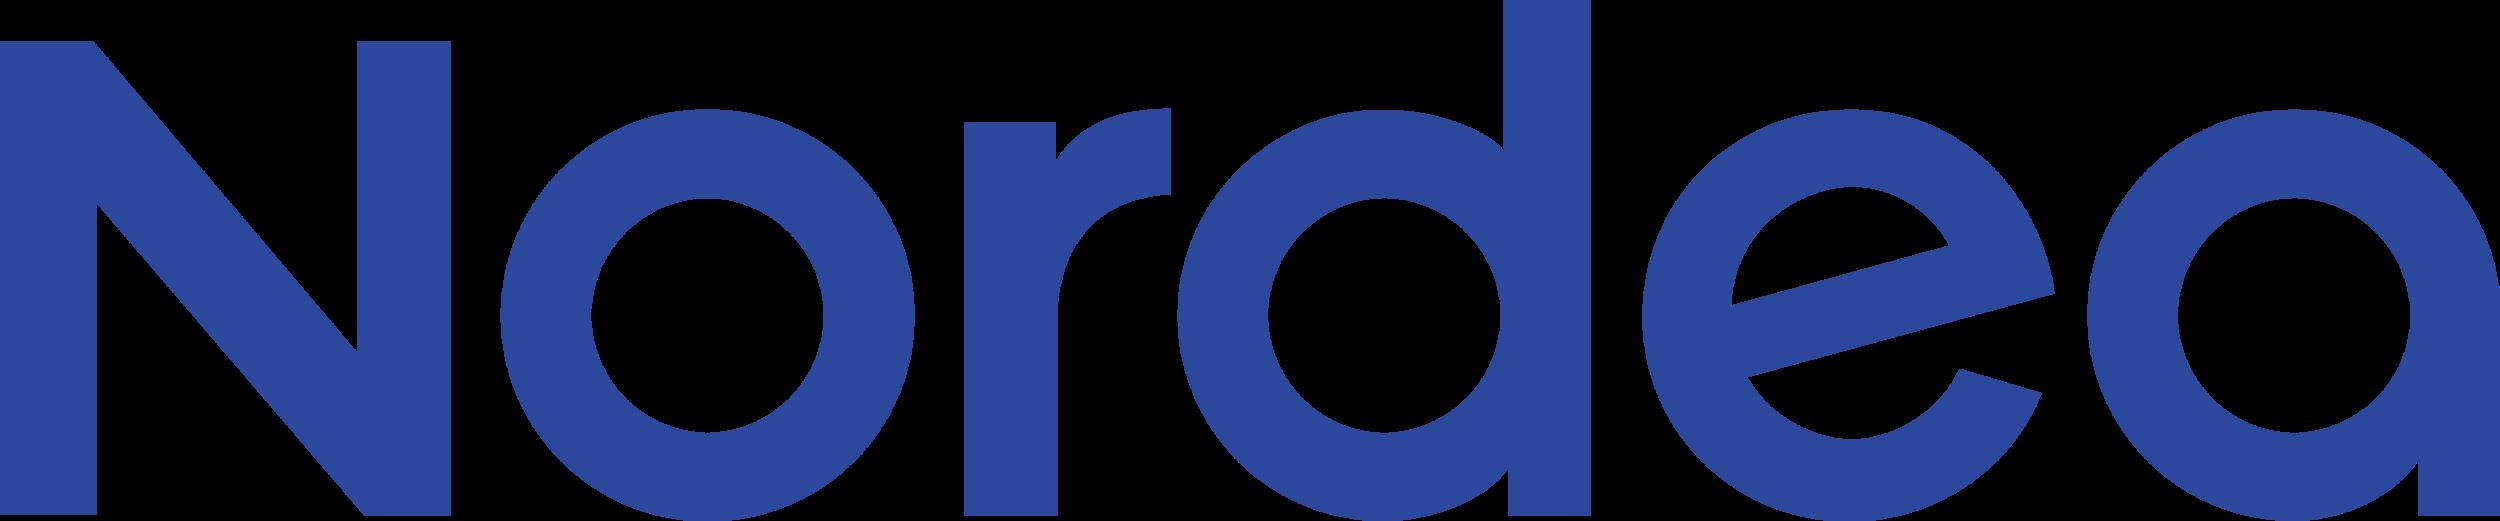 Nordea logo, for print.png